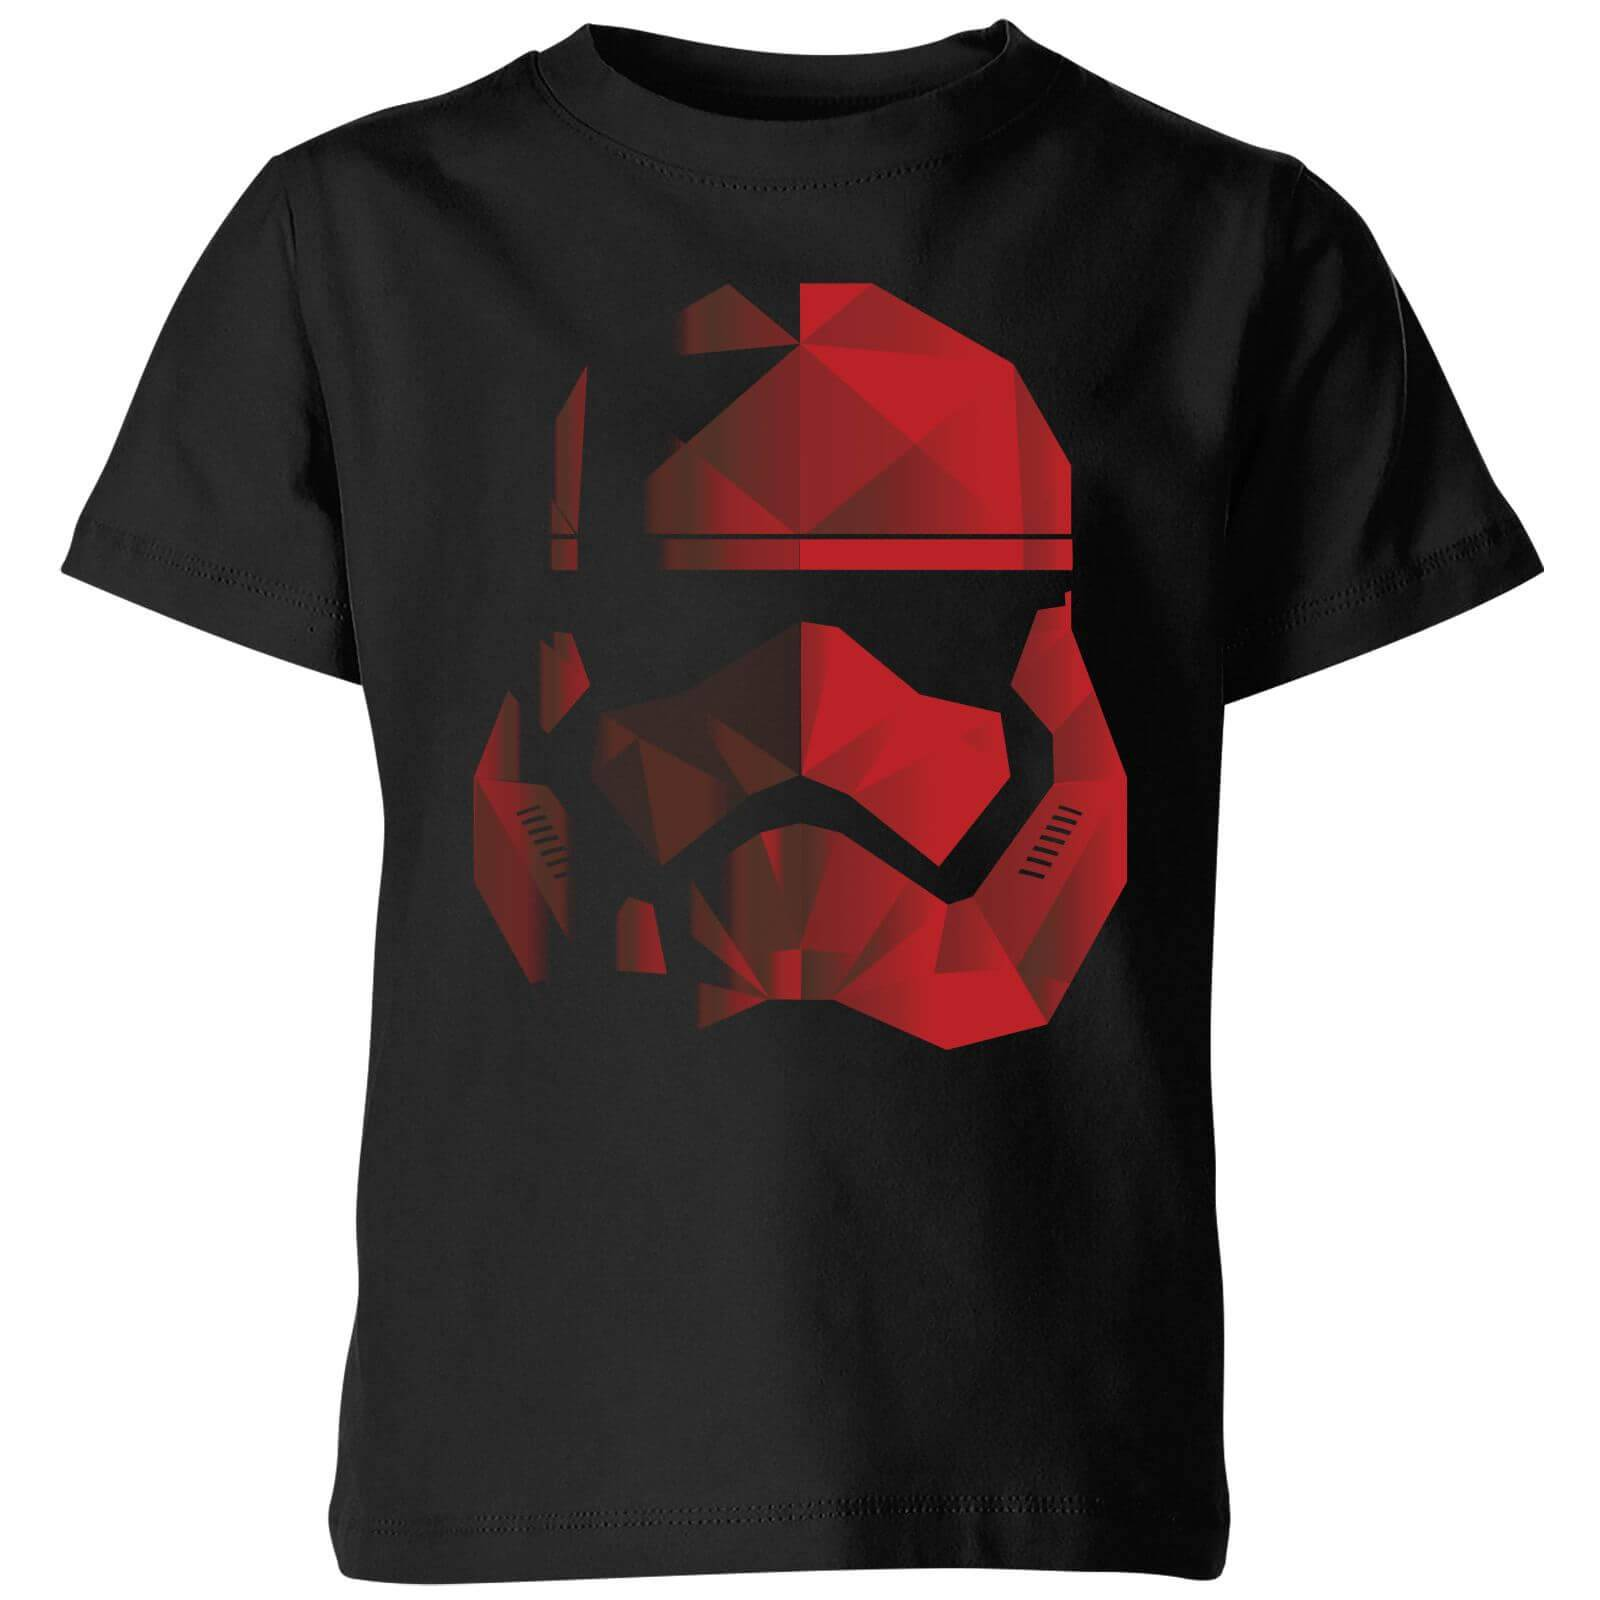 Star Wars T-Shirt Enfant Casque Stormtrooper Effet Cubiste - Star Wars - Noir - 3-4 ans - Noir